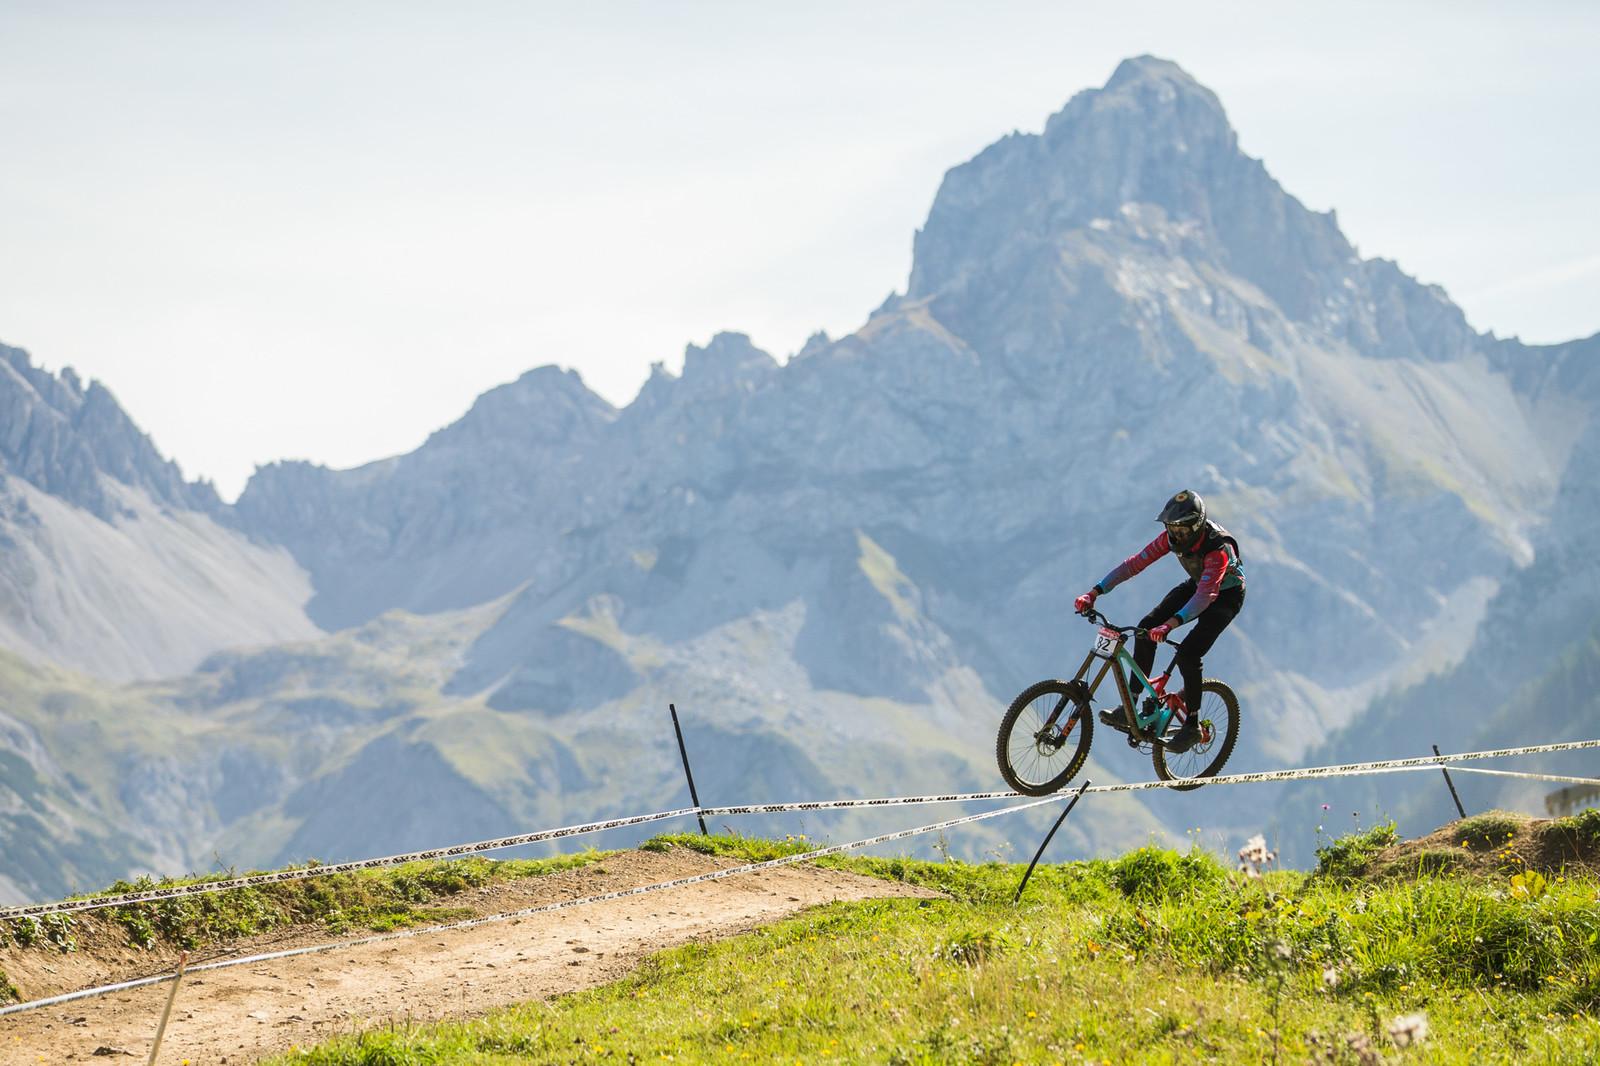 Josh Barth - 2019 iXS European Downhill Cup Brandnertal - Race Gallery - Mountain Biking Pictures - Vital MTB